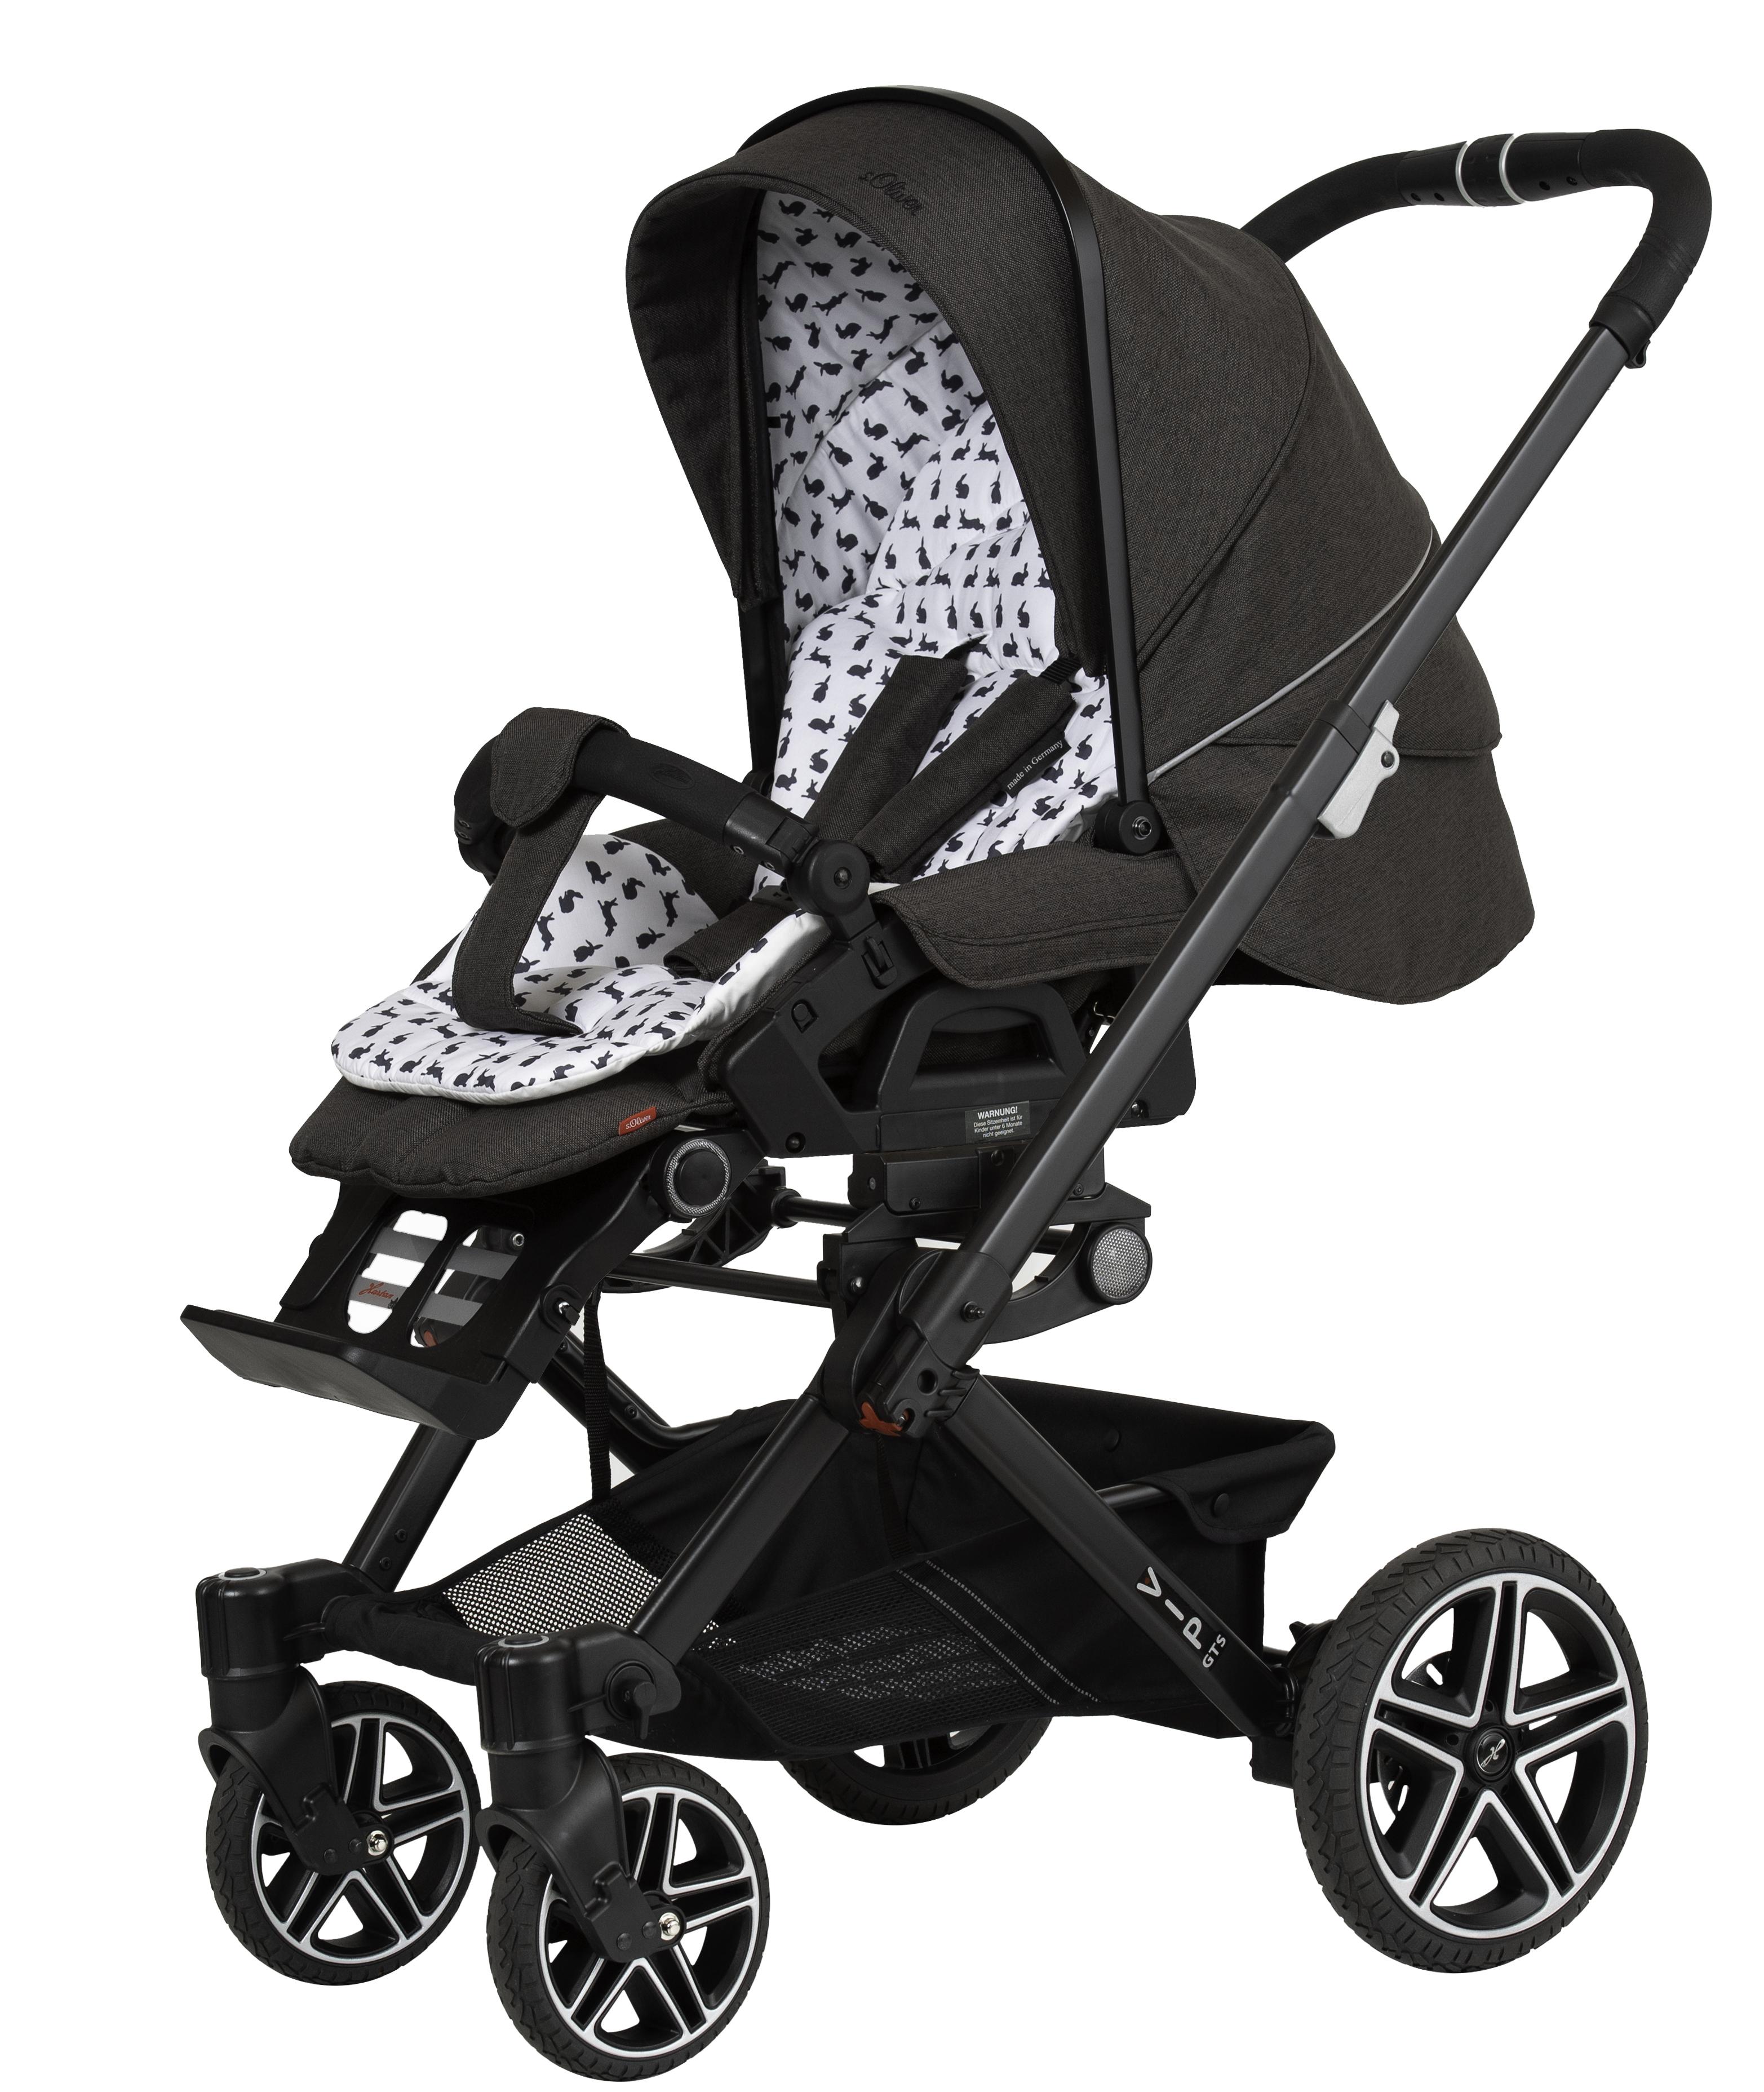 HARTAN Vip GTS S.Oliver (2021) Kombi-Kinderwagen